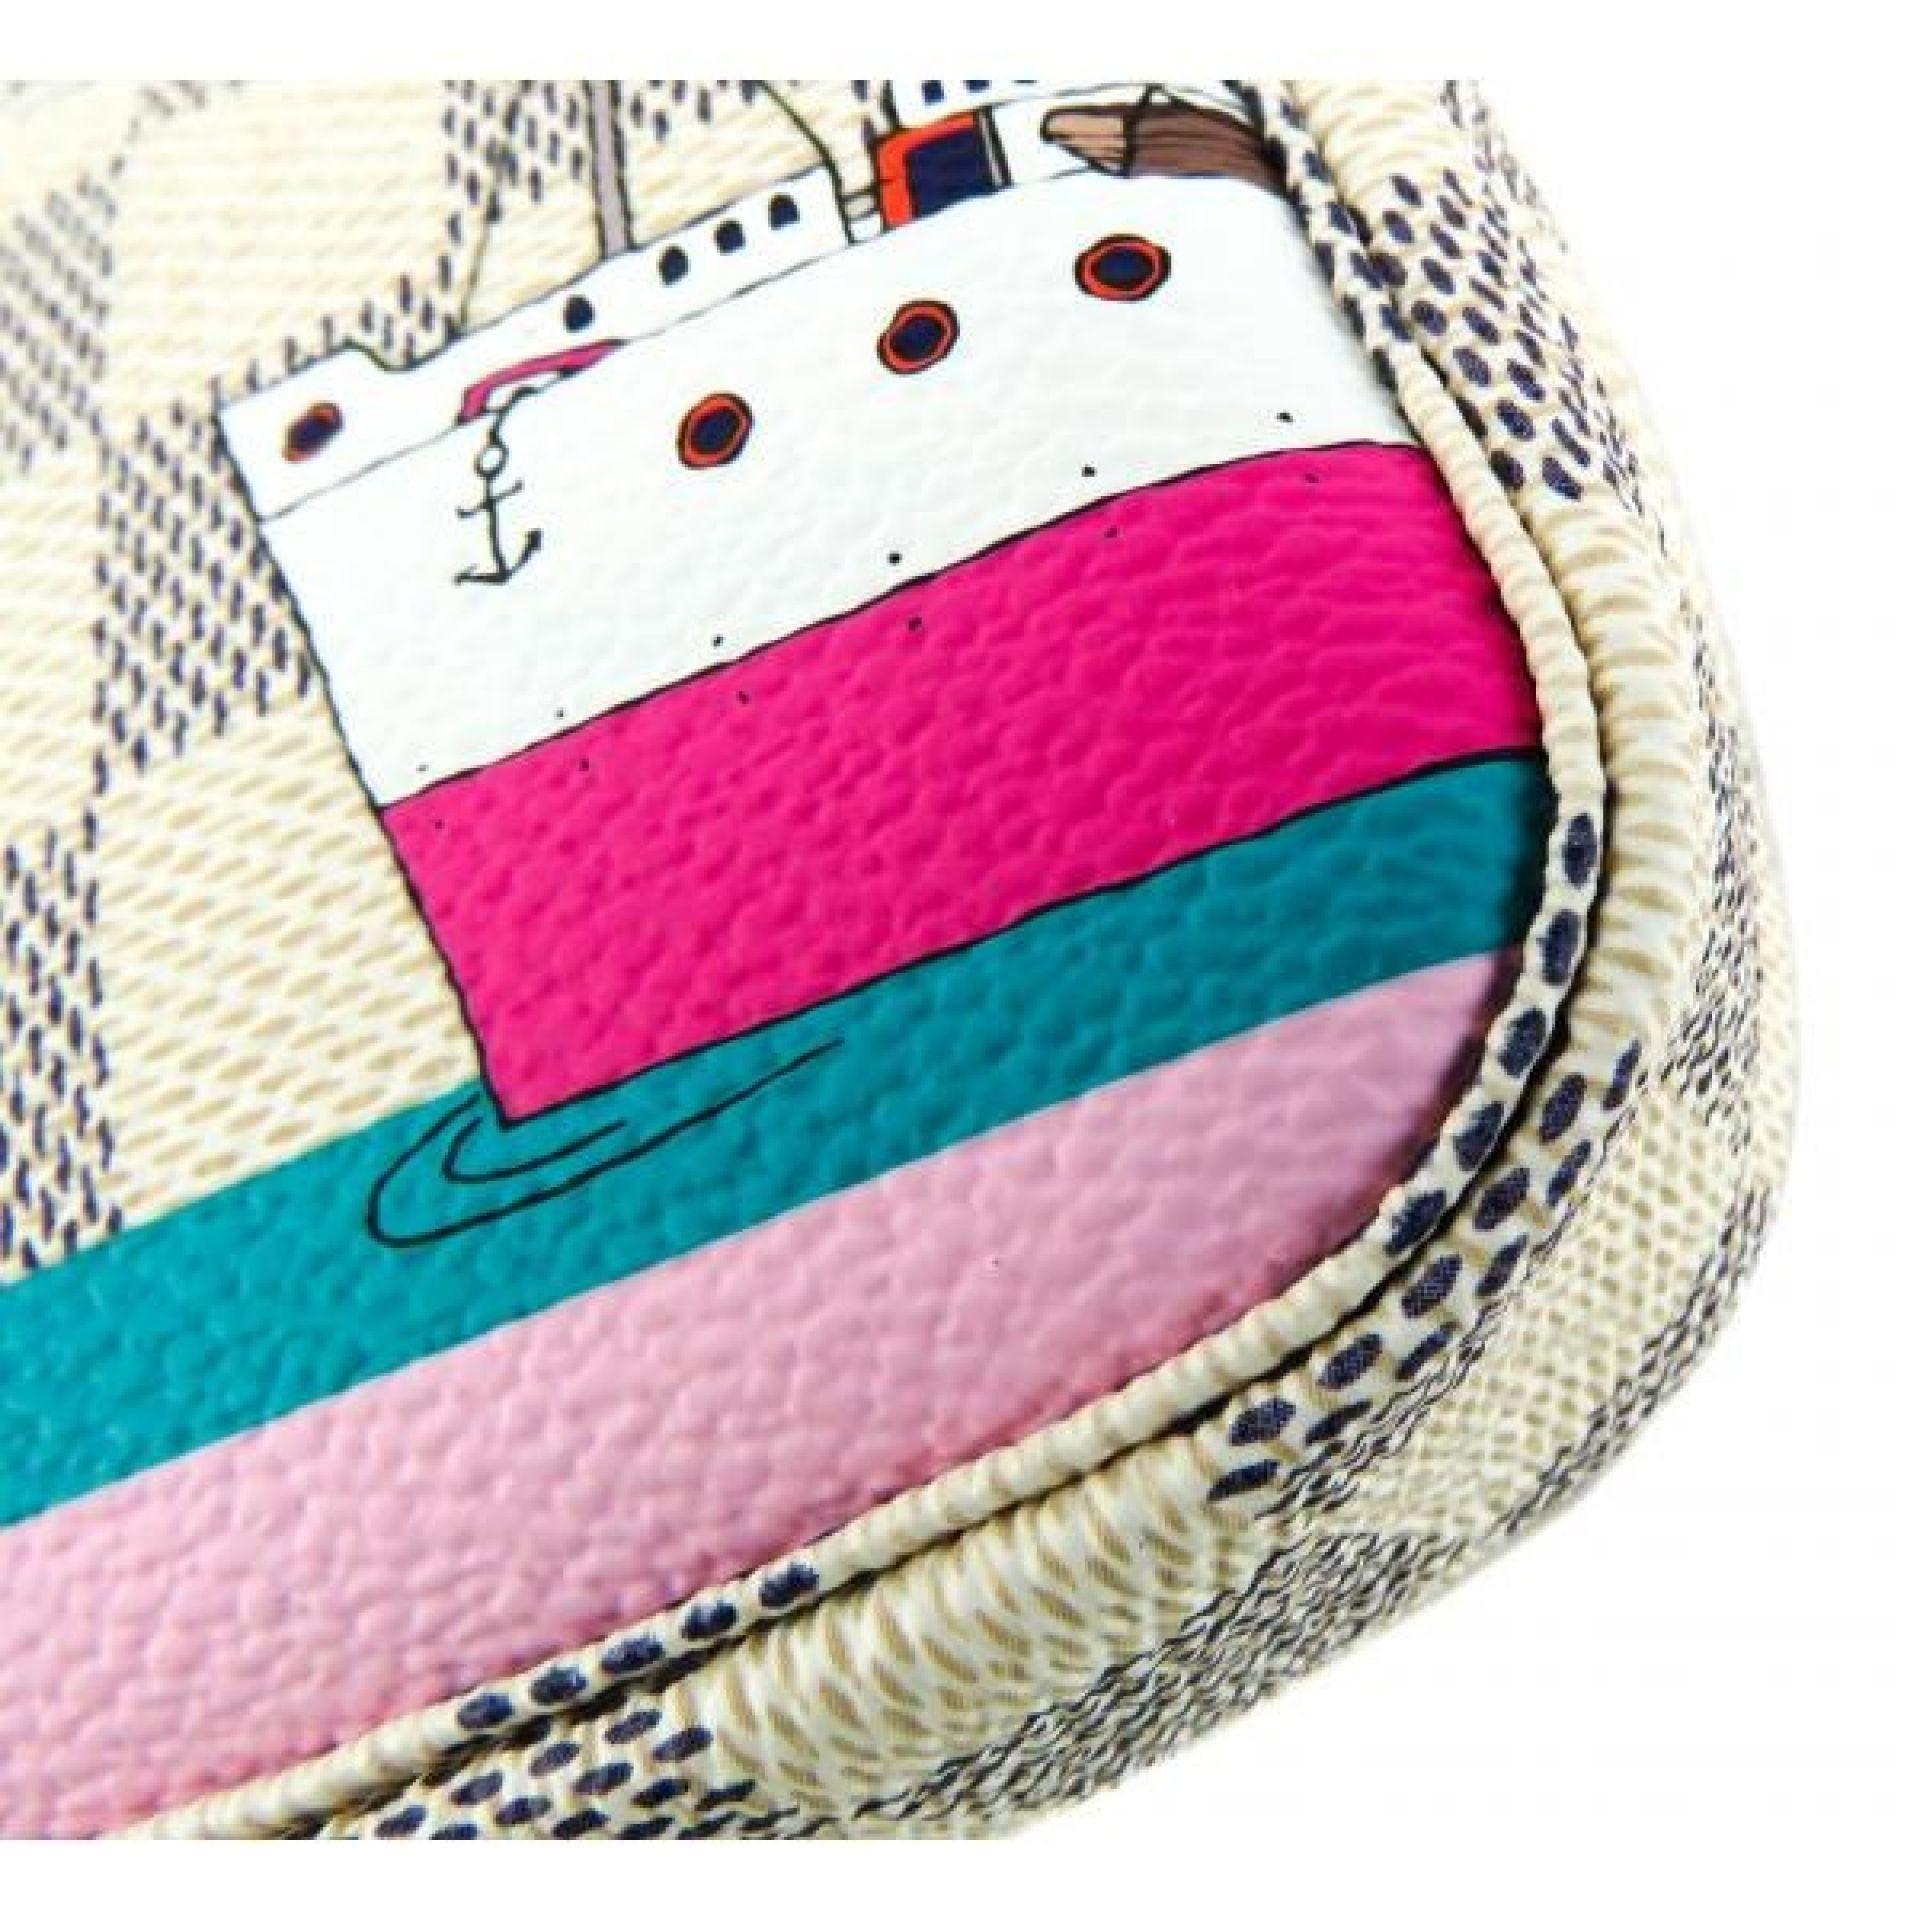 Louis Vuitton Azur Damier Canvas Limited Edition Luggage Mini Pochette Chain Wri